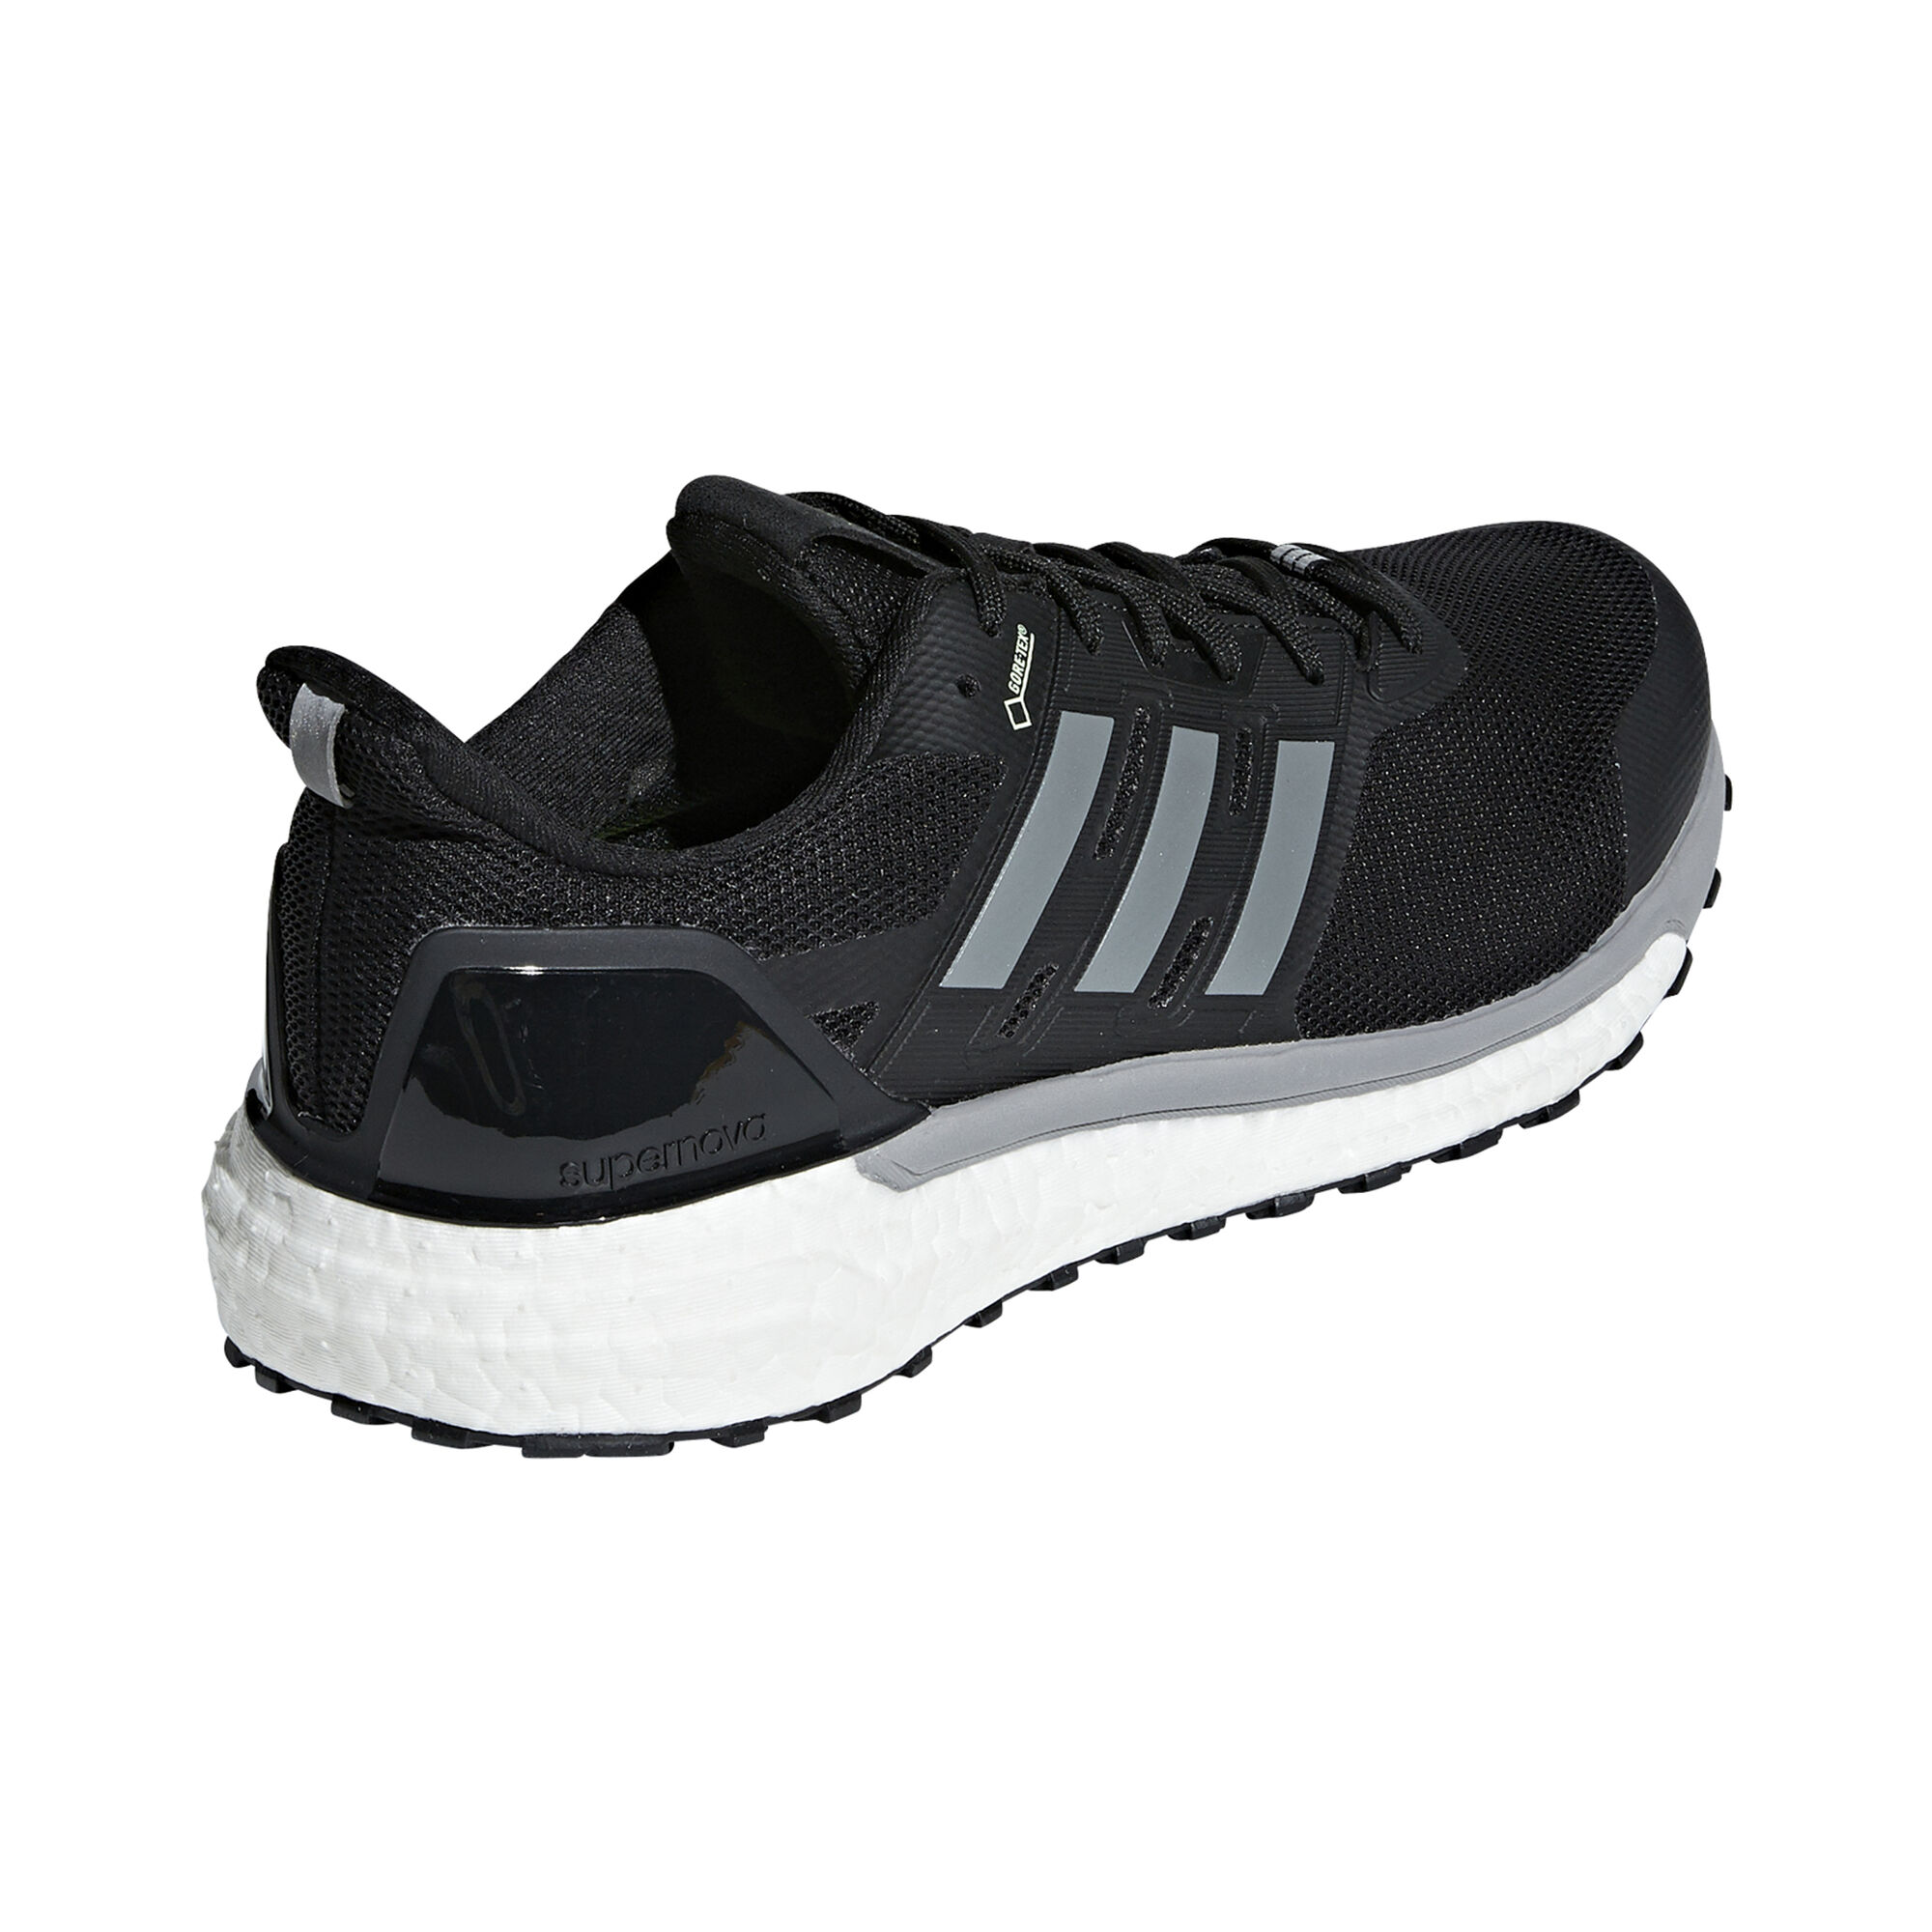 cf9fdf410 buy adidas Supernova GTX Neutral Running Shoe Men - Black